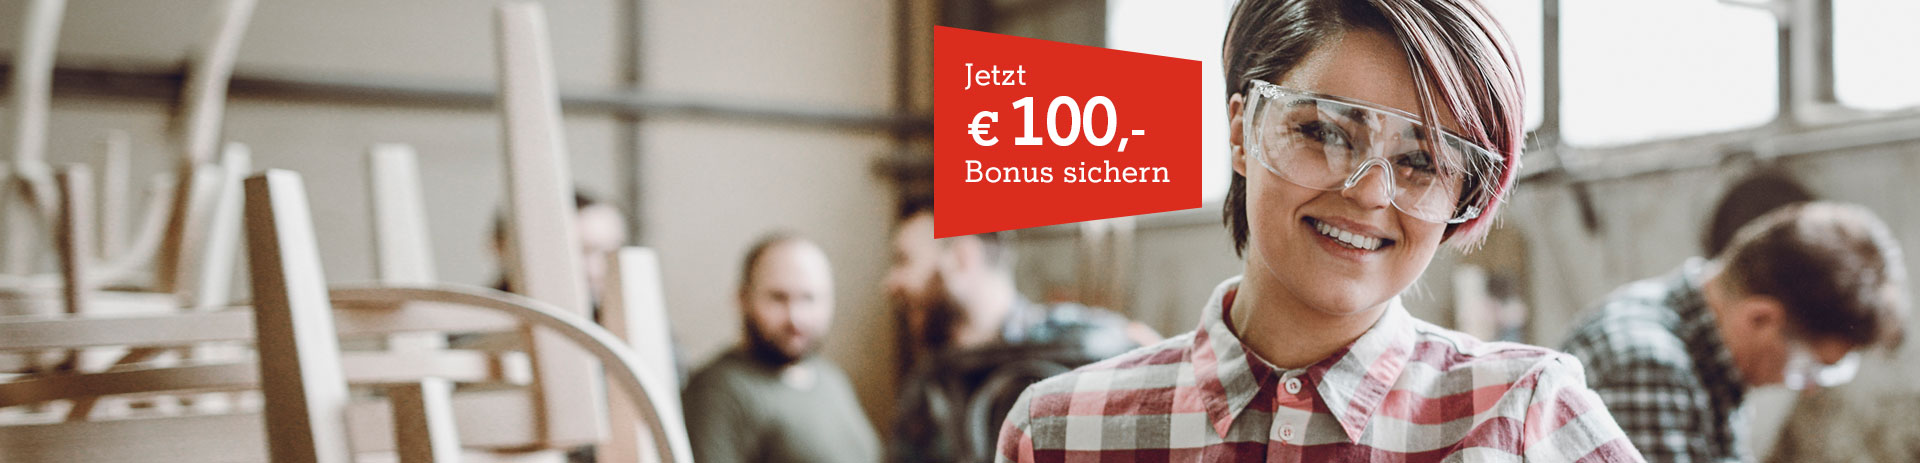 Minus € 15,- bei Neubestellung von A1 Festnetz-Internet Business oder A1 Business Kombi